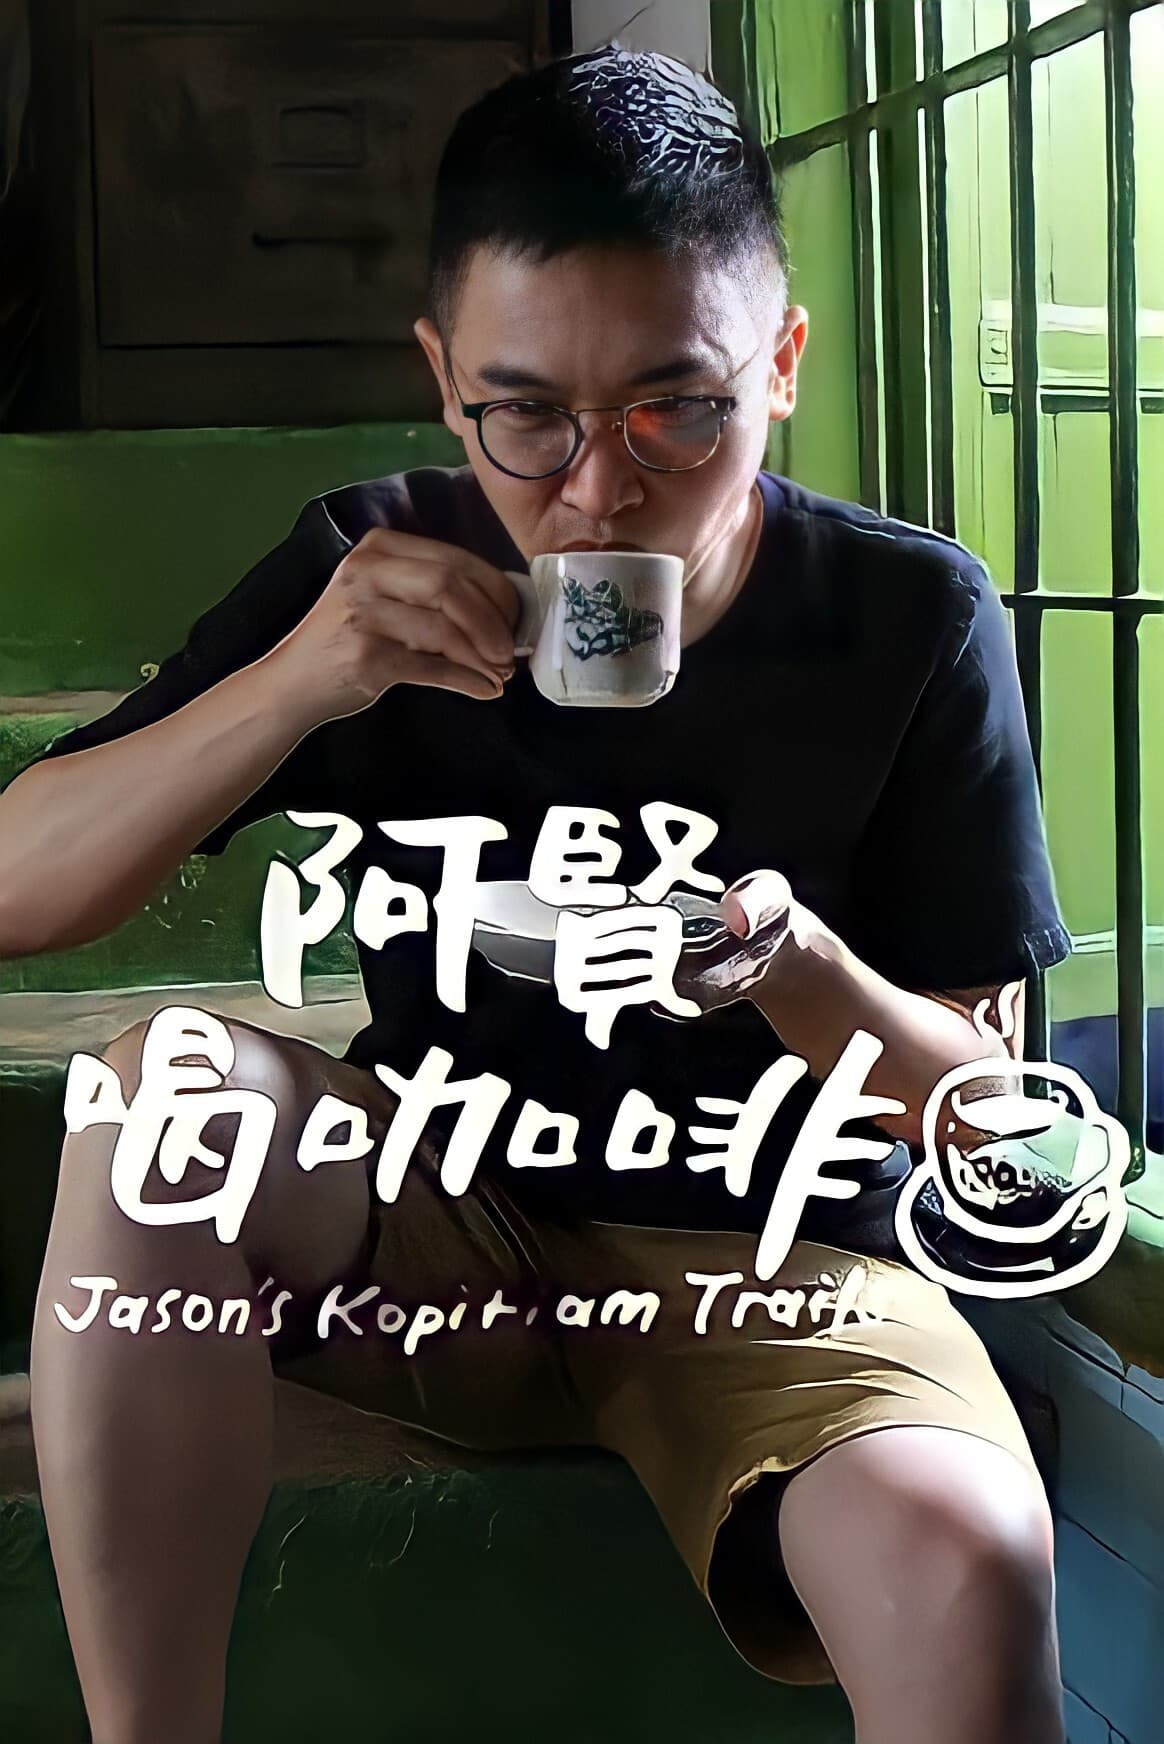 阿贤喝咖啡 TV Shows About Coffee Shop